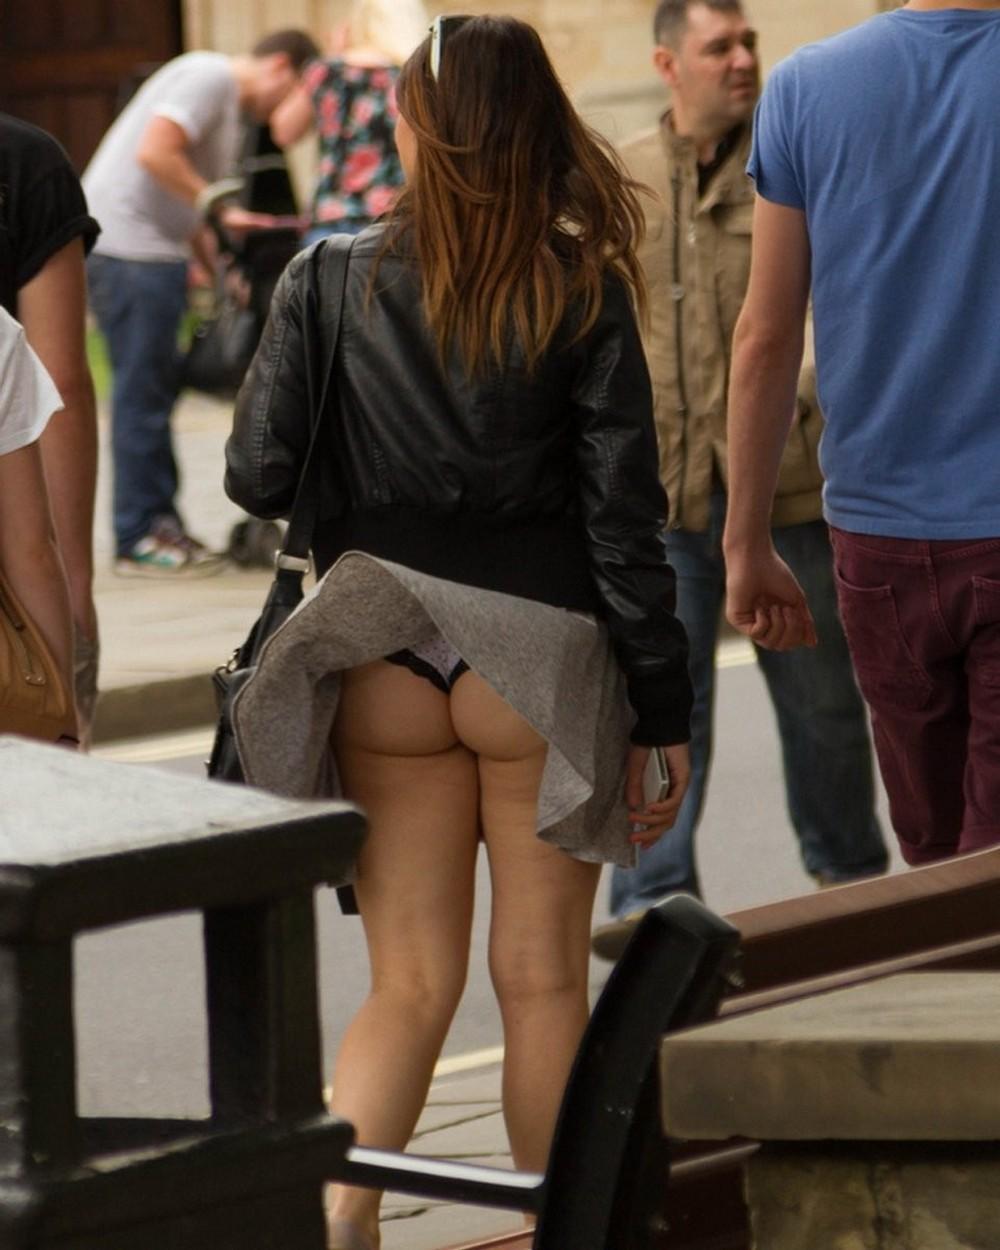 Nude In Public Pics